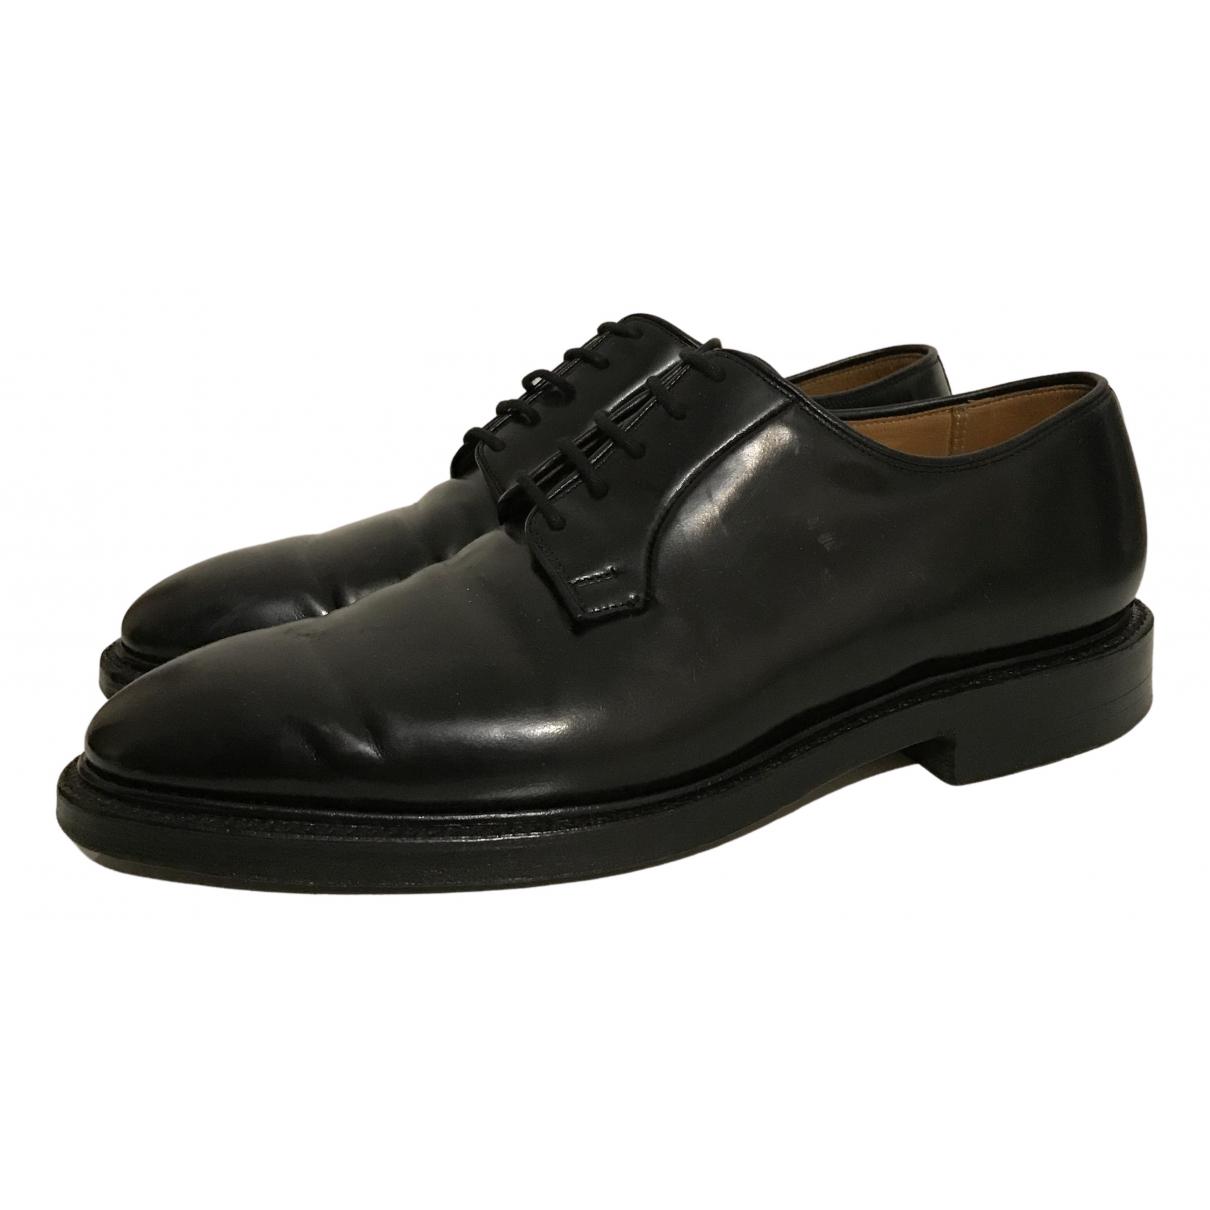 Crockett& Jones - Derbies   pour homme en cuir - noir